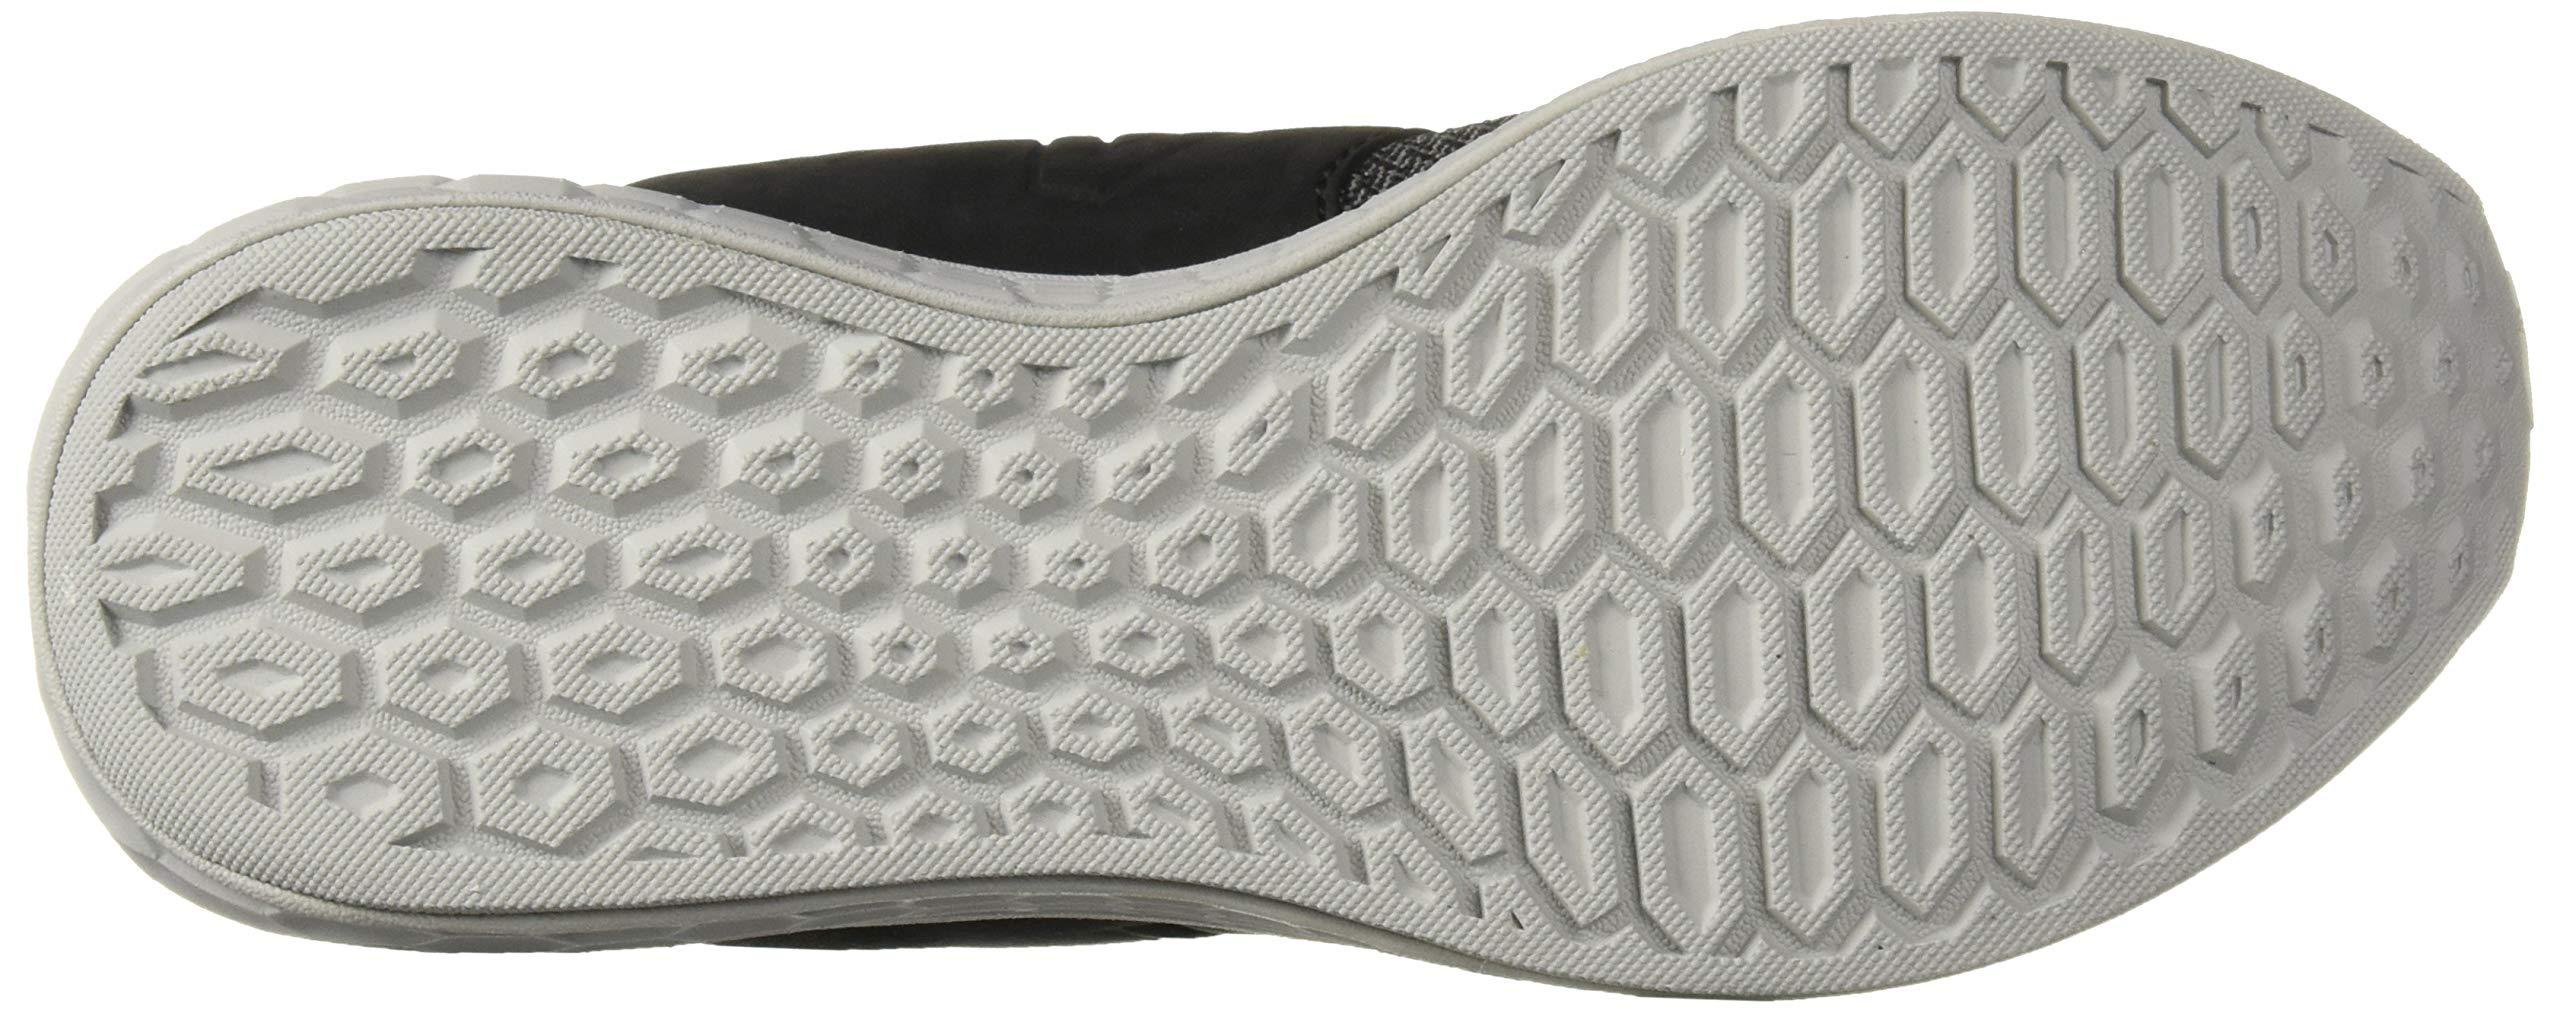 New Balance Men's Cruz V2 Fresh Foam Running Shoe, black/castlerock/nubuck, 7 D US by New Balance (Image #3)